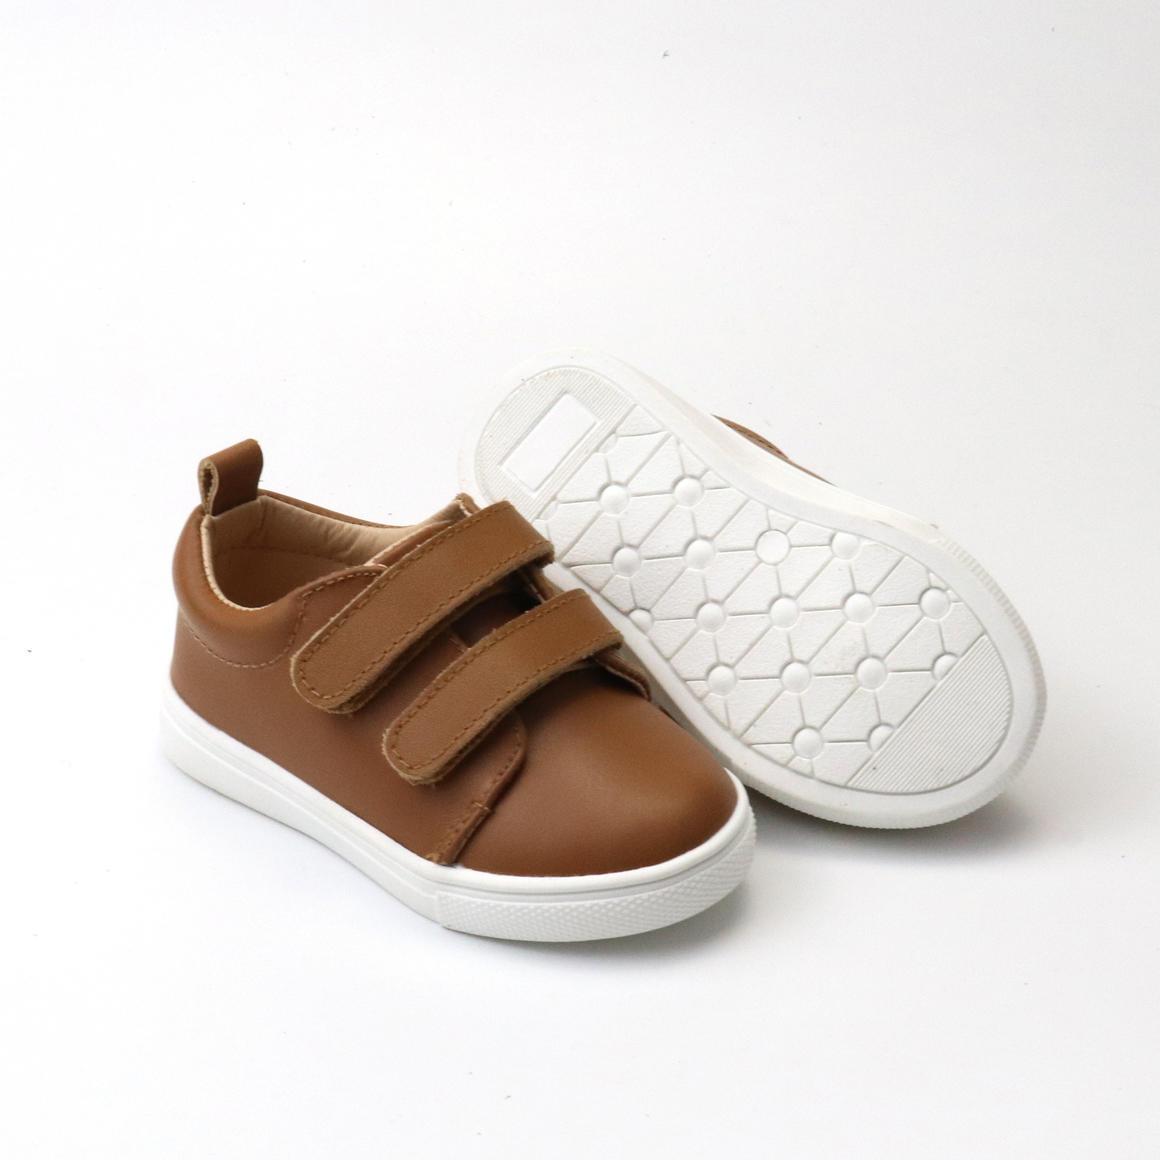 Dallas Sneakers - Brown | Trada Marketplace